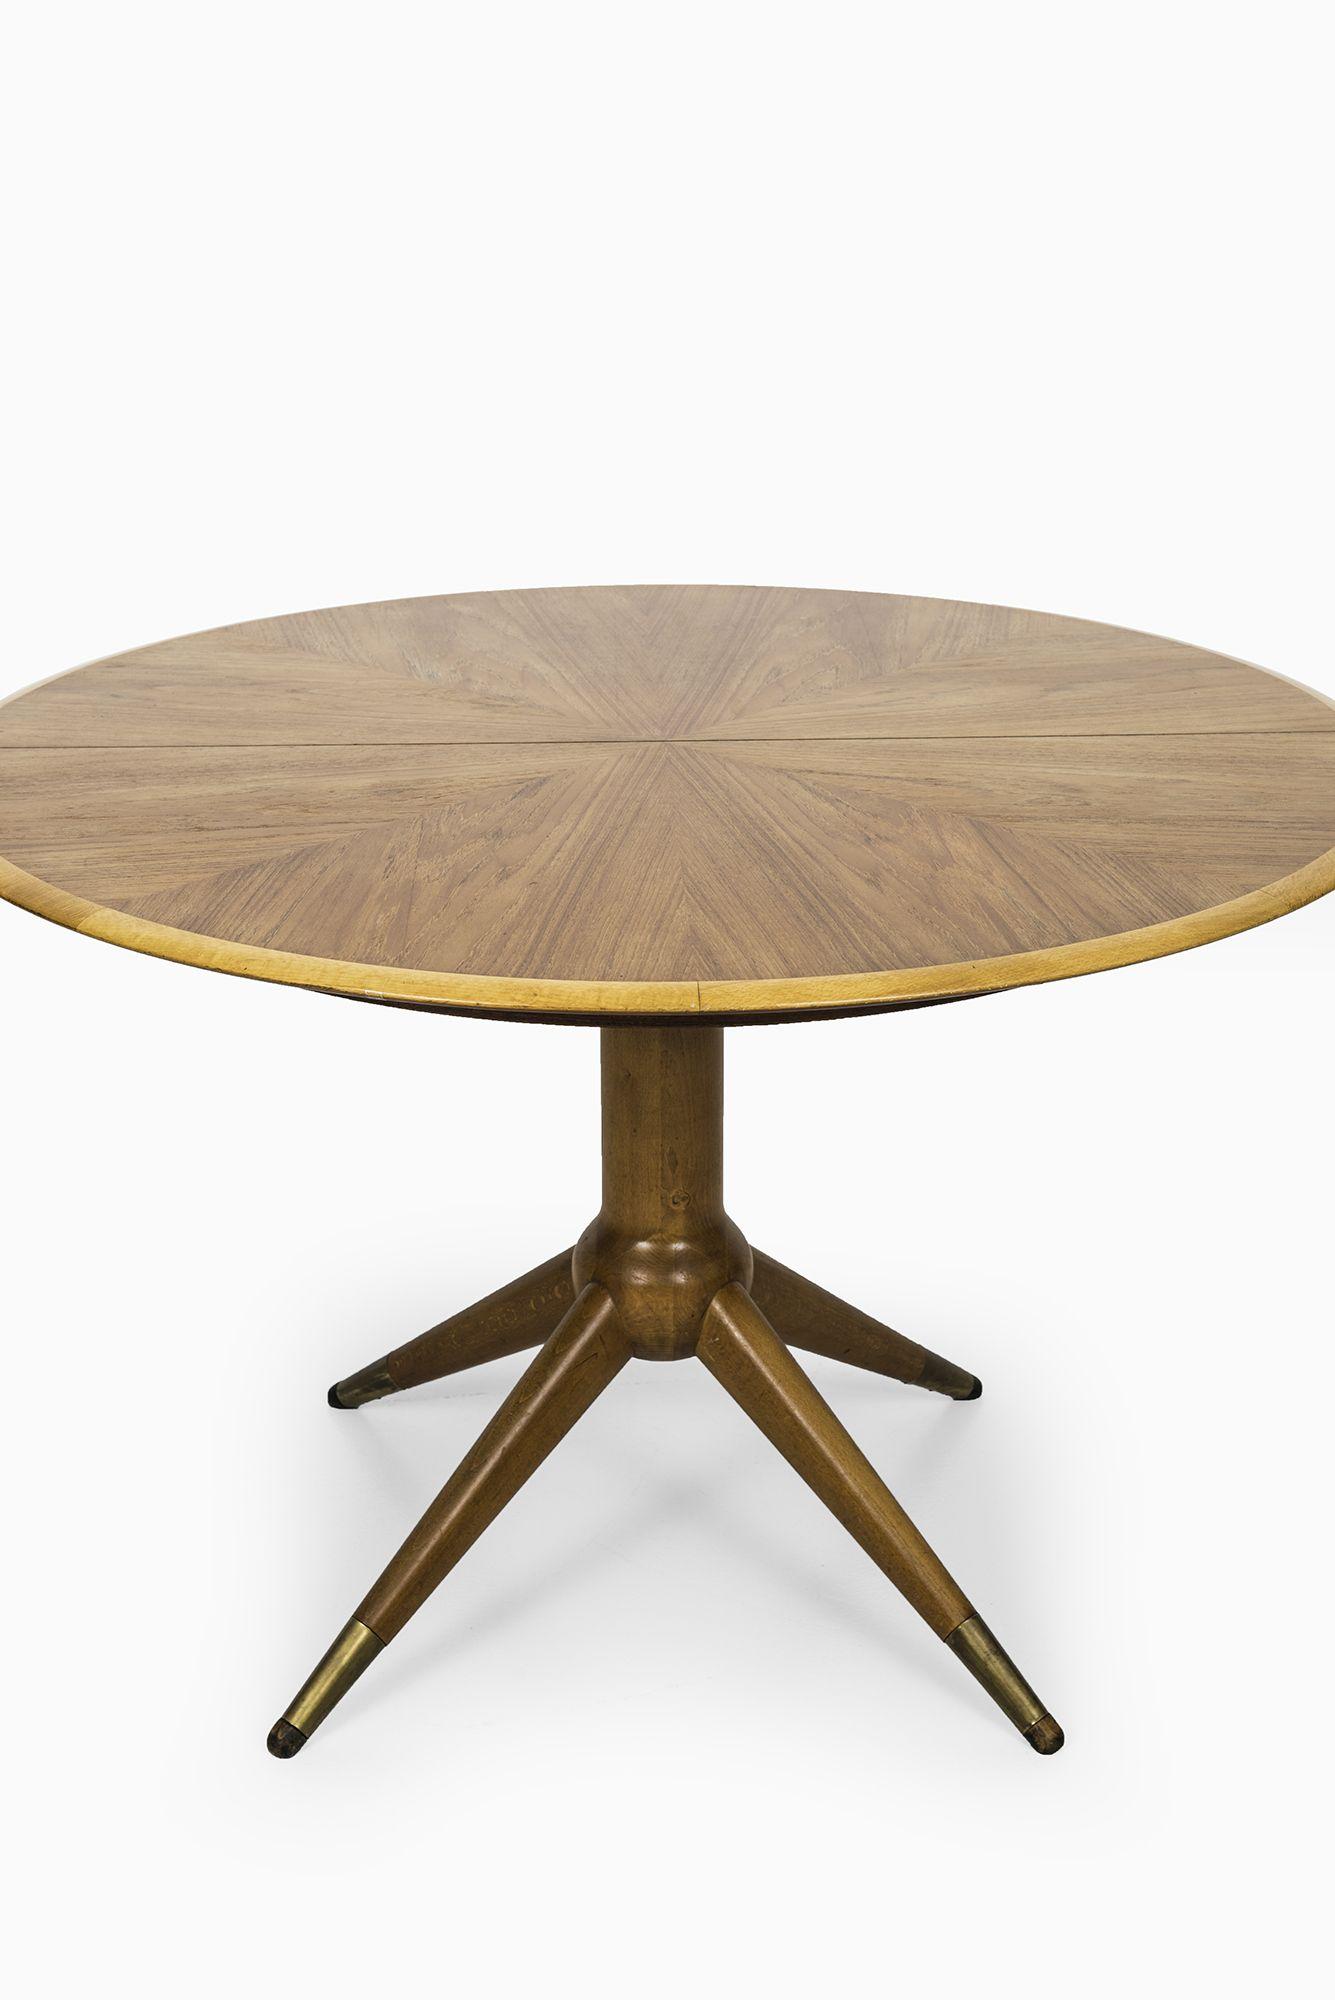 David Rosén dining table in teak, beech and brass at Studio Schalling